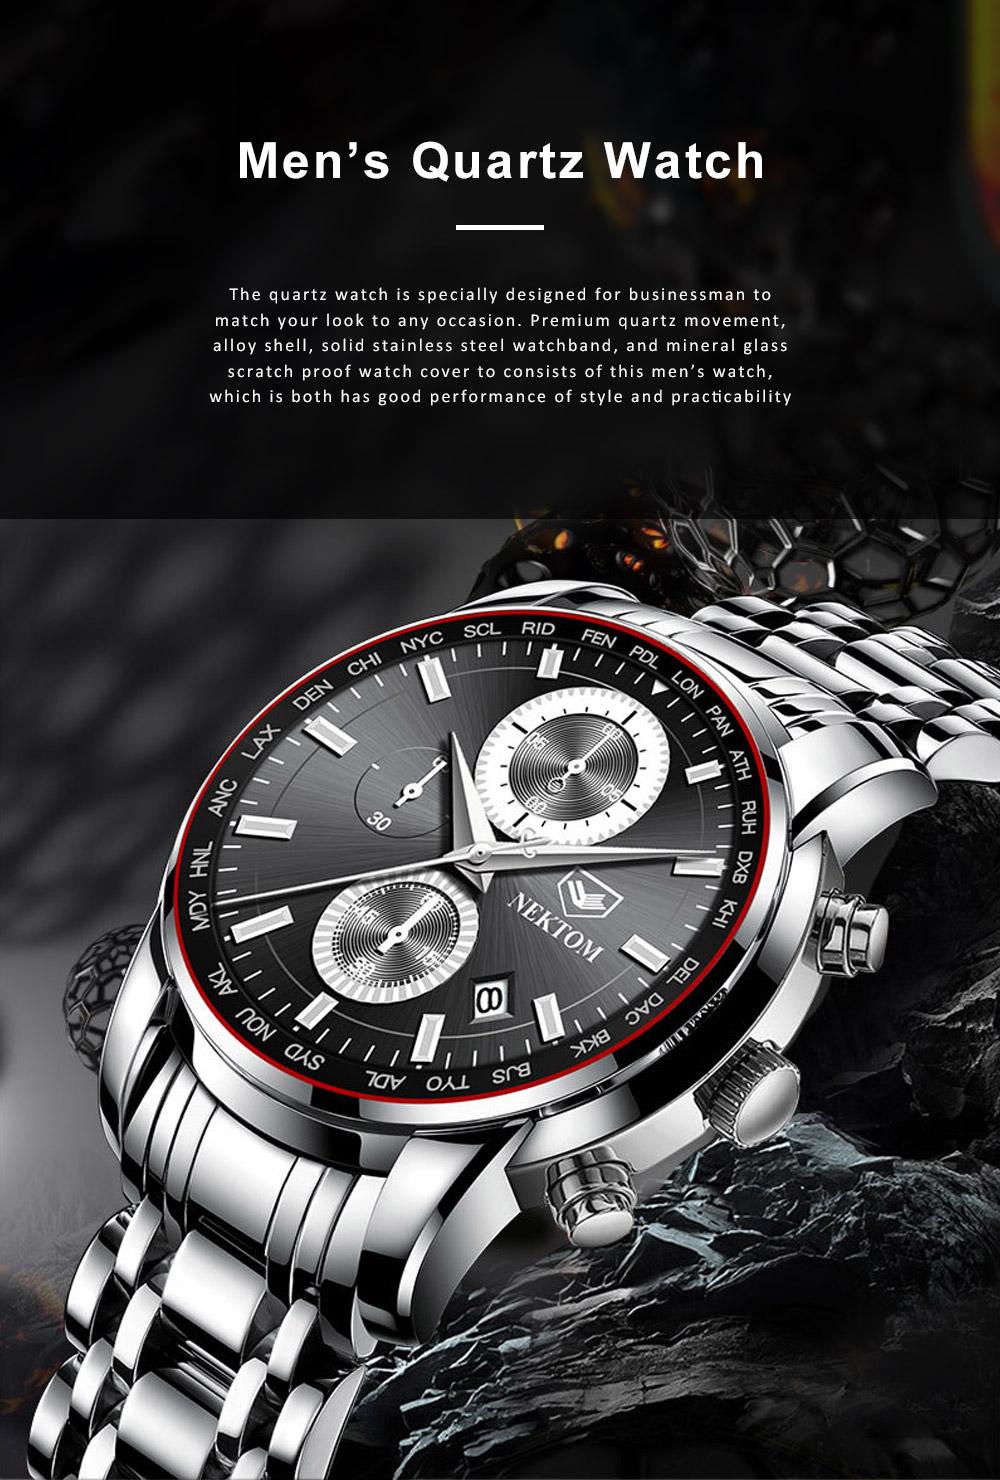 Men's Quartz Watch Multifunctional Waterproof Wrist Watch Scratch Proof Fashion Accessory Watch 0